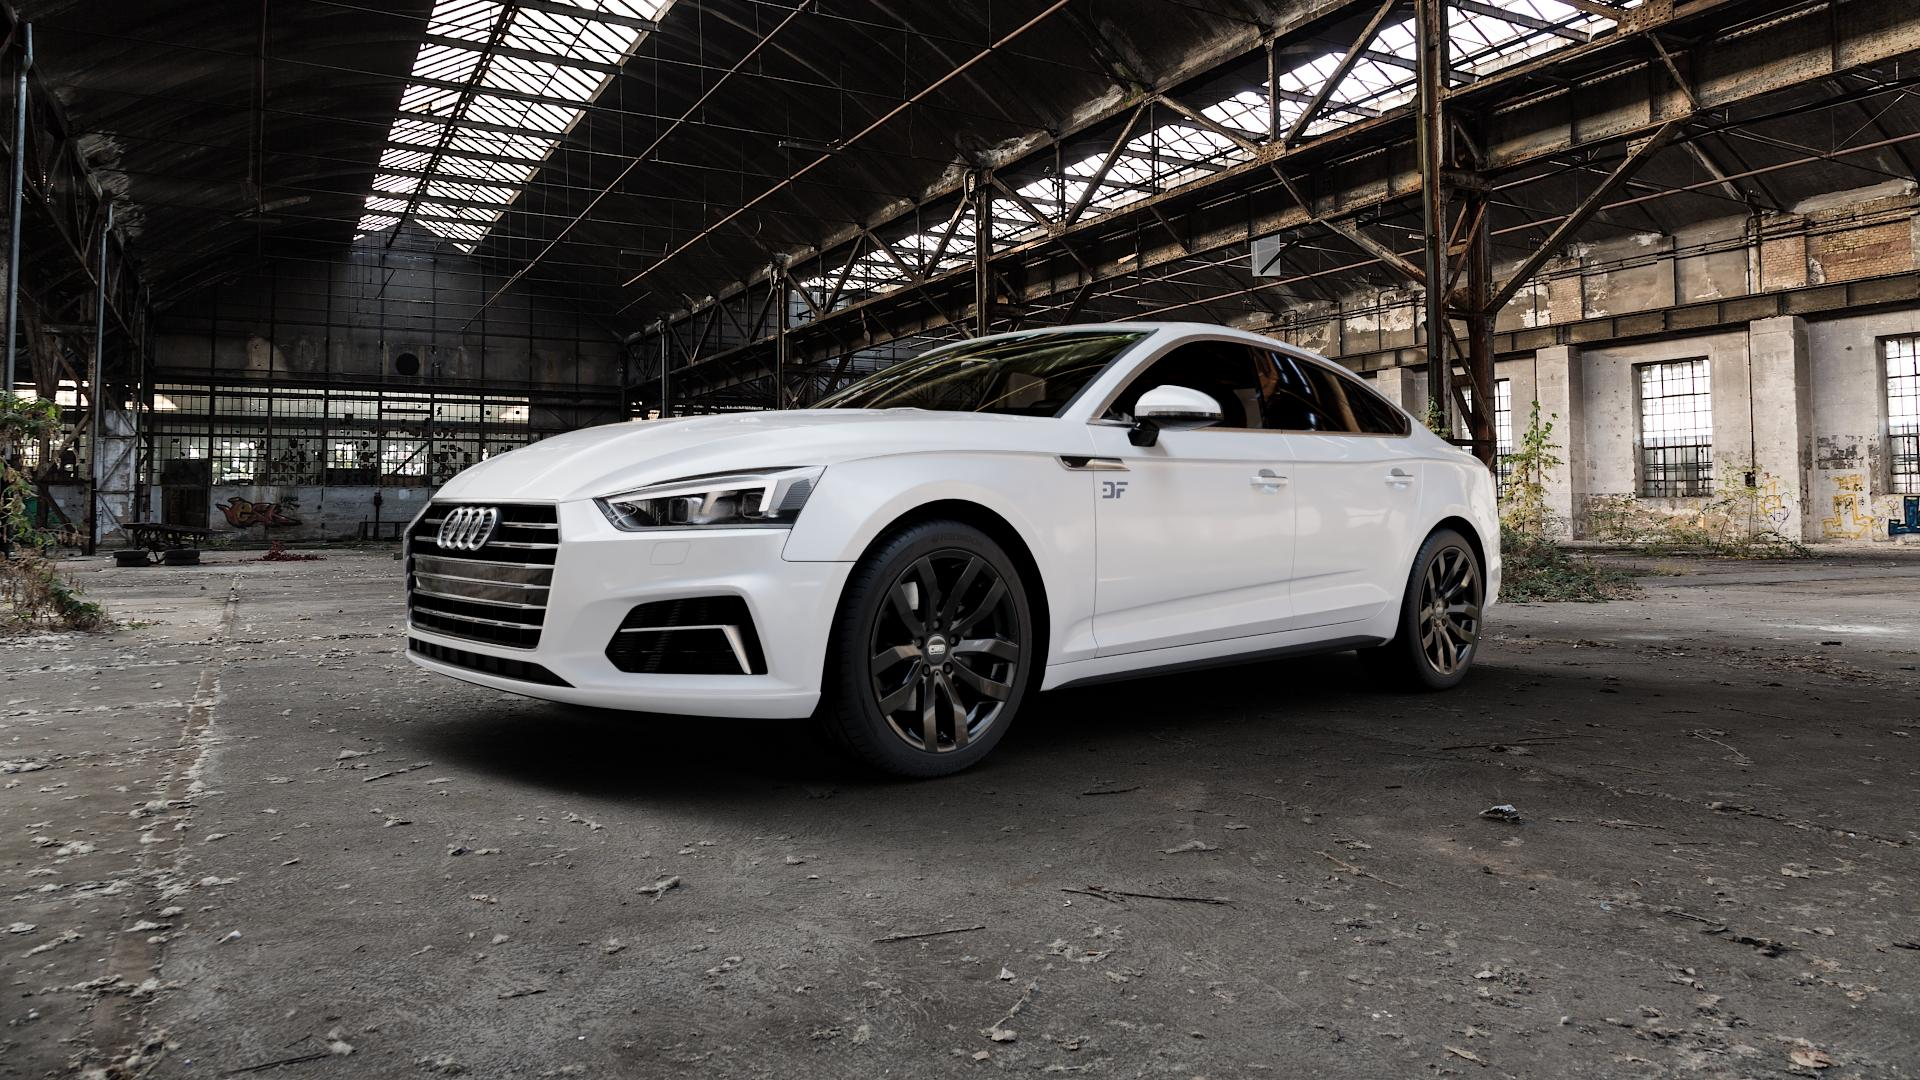 CMS C22 Complete Black Gloss Felge mit Reifen in 18Zoll Winterfelge Alufelge auf weissem Audi A5 Typ B9 (Sportback) 2,0l TDI 140kW (190 PS) quattro TFSI 185kW (252 3,0l 160kW (218 200kW (272 1,4l 110kW (150 183kW (249 g-tron 125kW (170 Mild-Hybrid 100kW (136 210kW (286 45 180kW (245 35 40 50 170kW (231 120kW (163 30 ⬇️ mit 15mm Ti